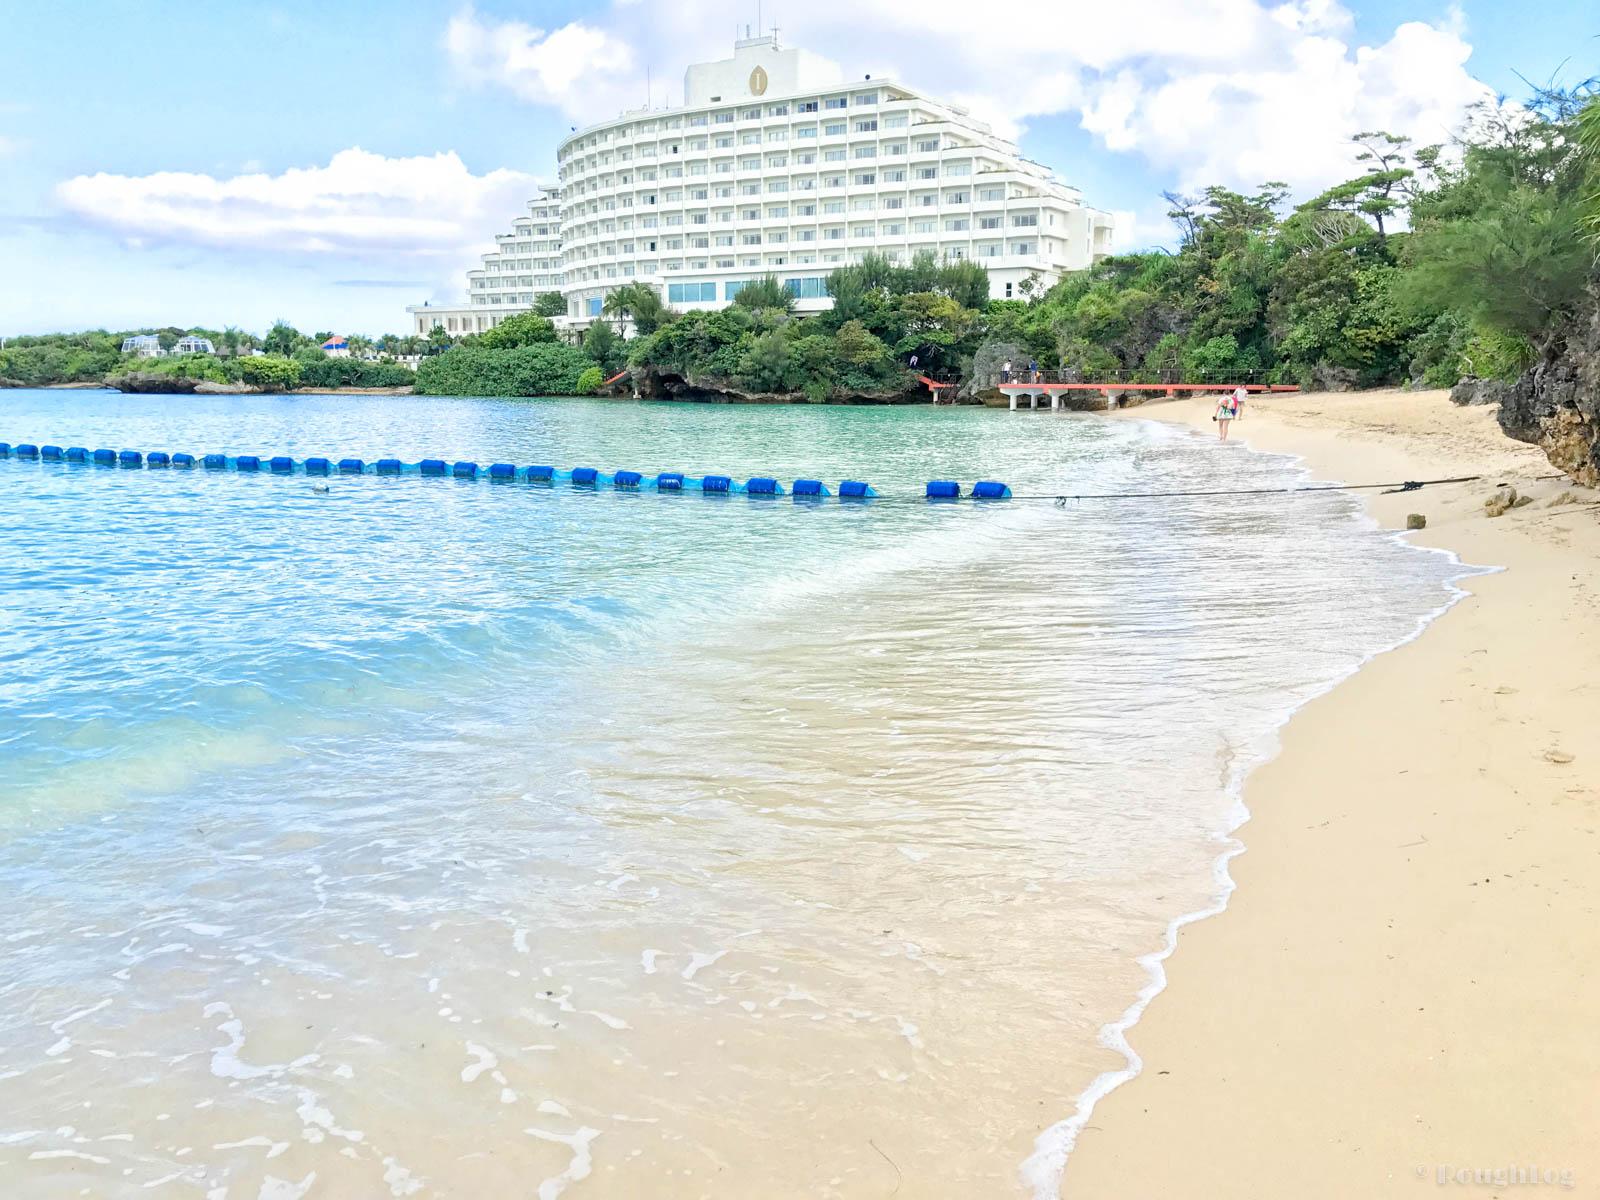 ANAインターコンチネンタル万座ビーチリゾートのビーチ